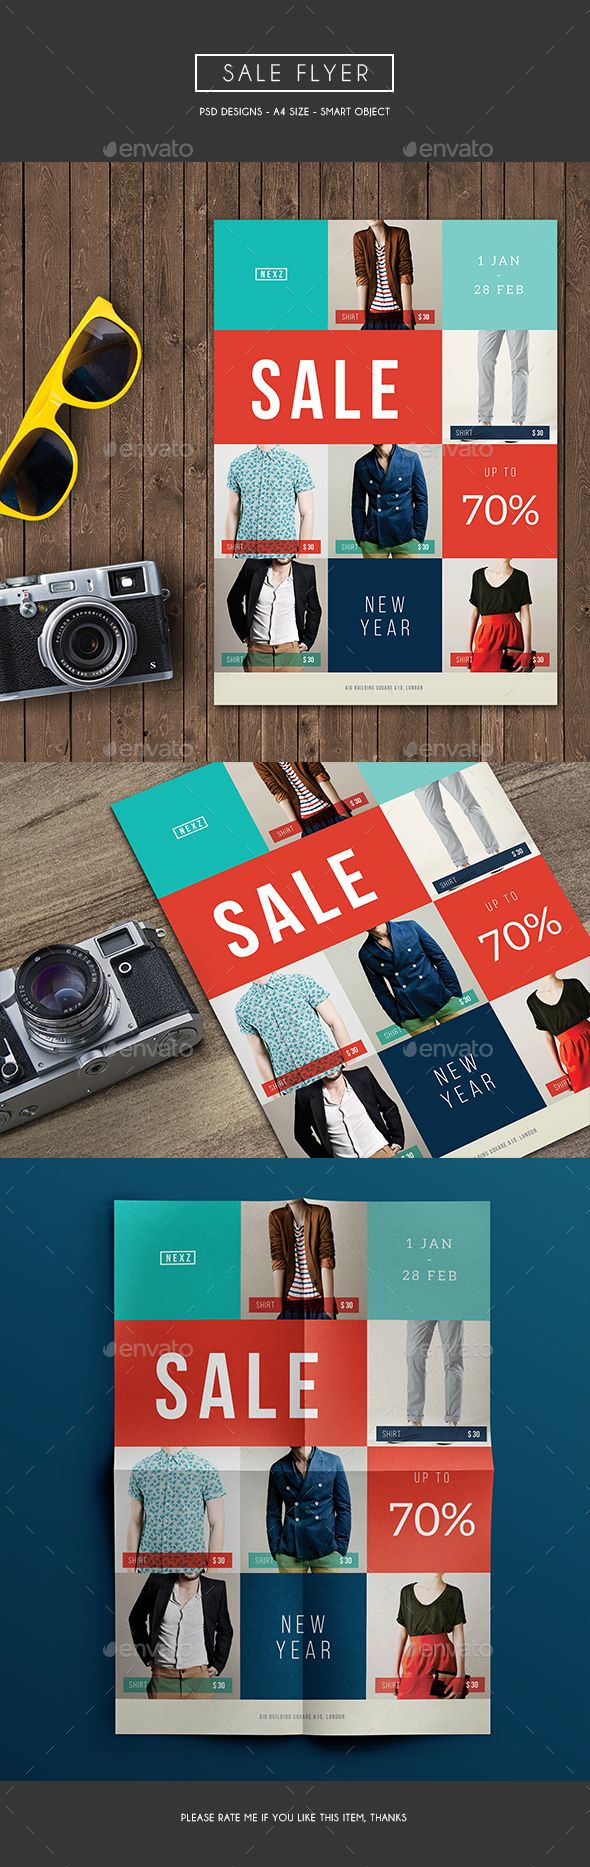 Sale Flyer Template PSD. Download here: http://graphicriver.net/item/sale-flyer/15914412?ref=ksioks